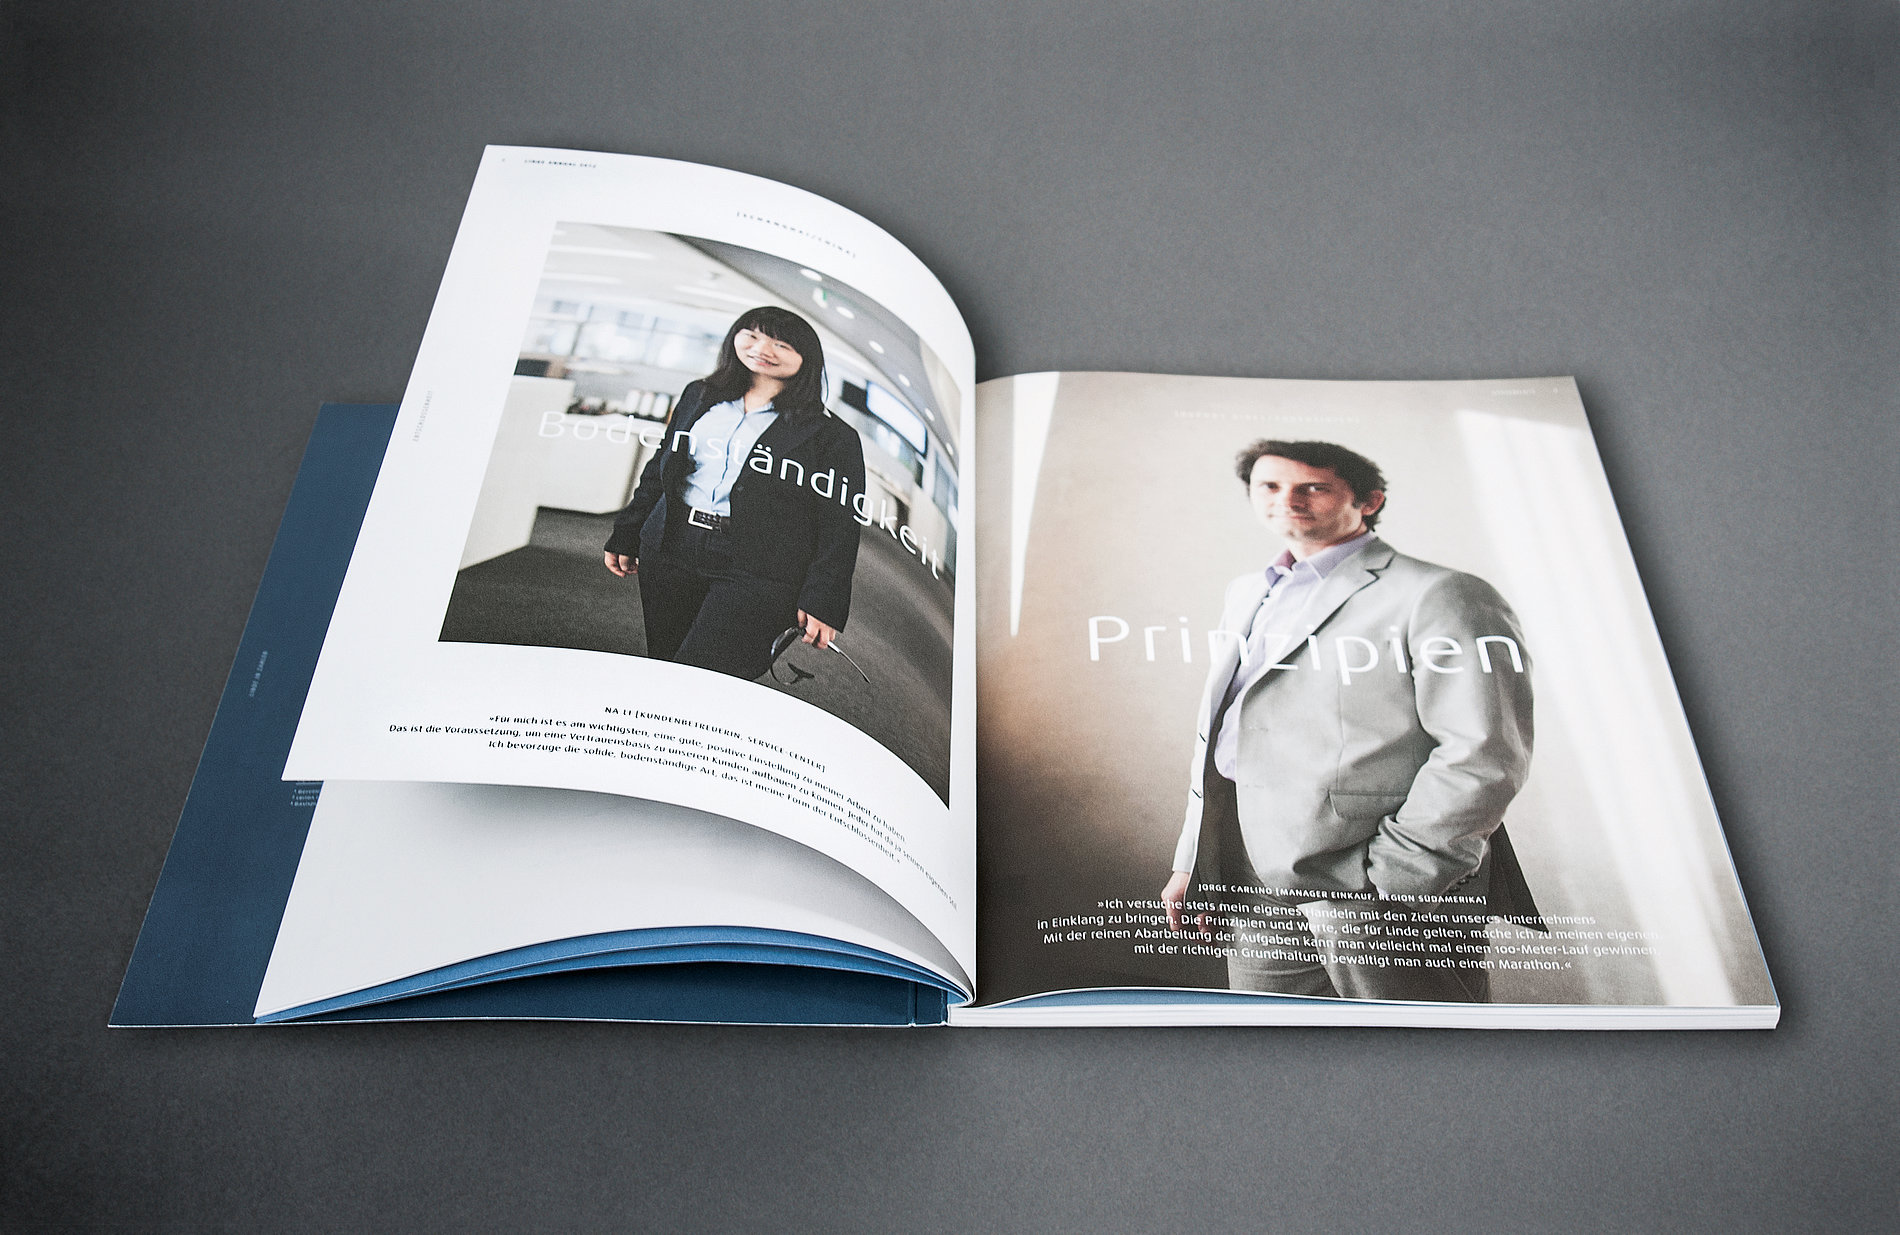 Entschlossenheit Determination Linde Annual Report 2012 | Red Dot Design Award